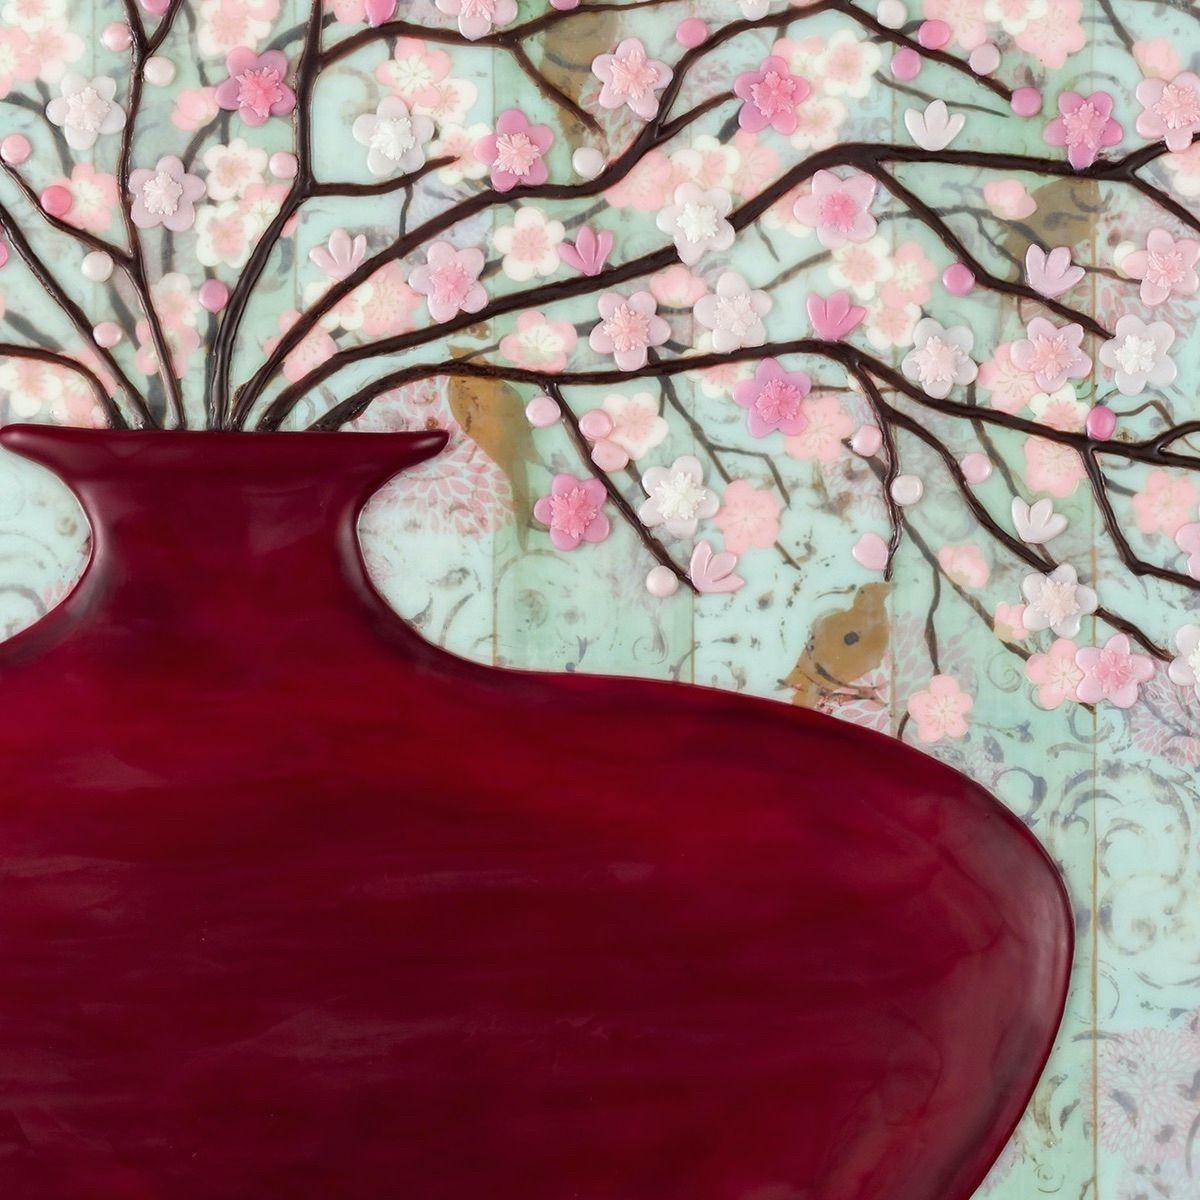 Cherry Blossoms (partial image)